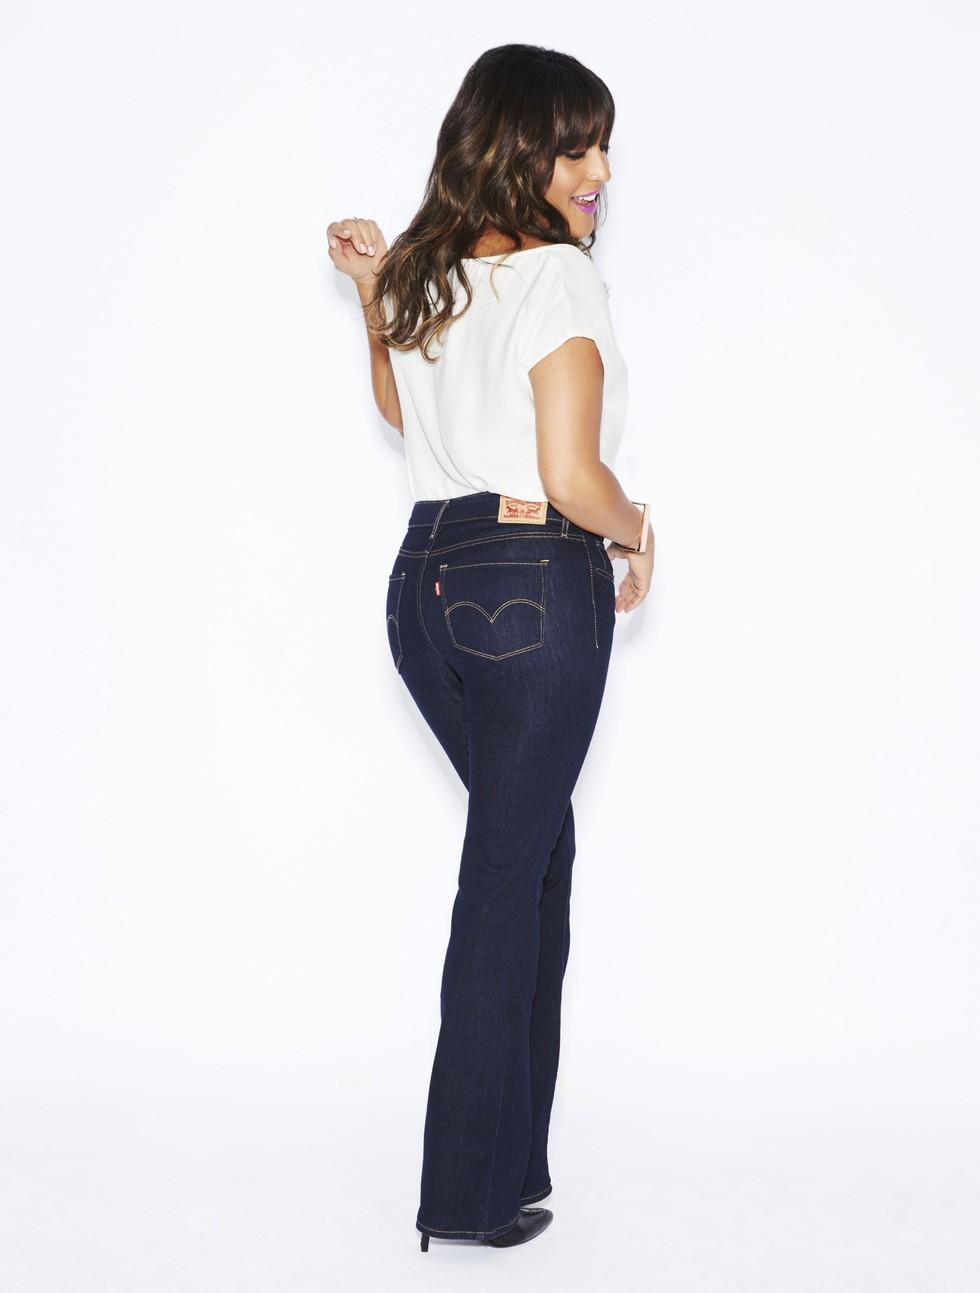 Best White Jeans For Curvy Women